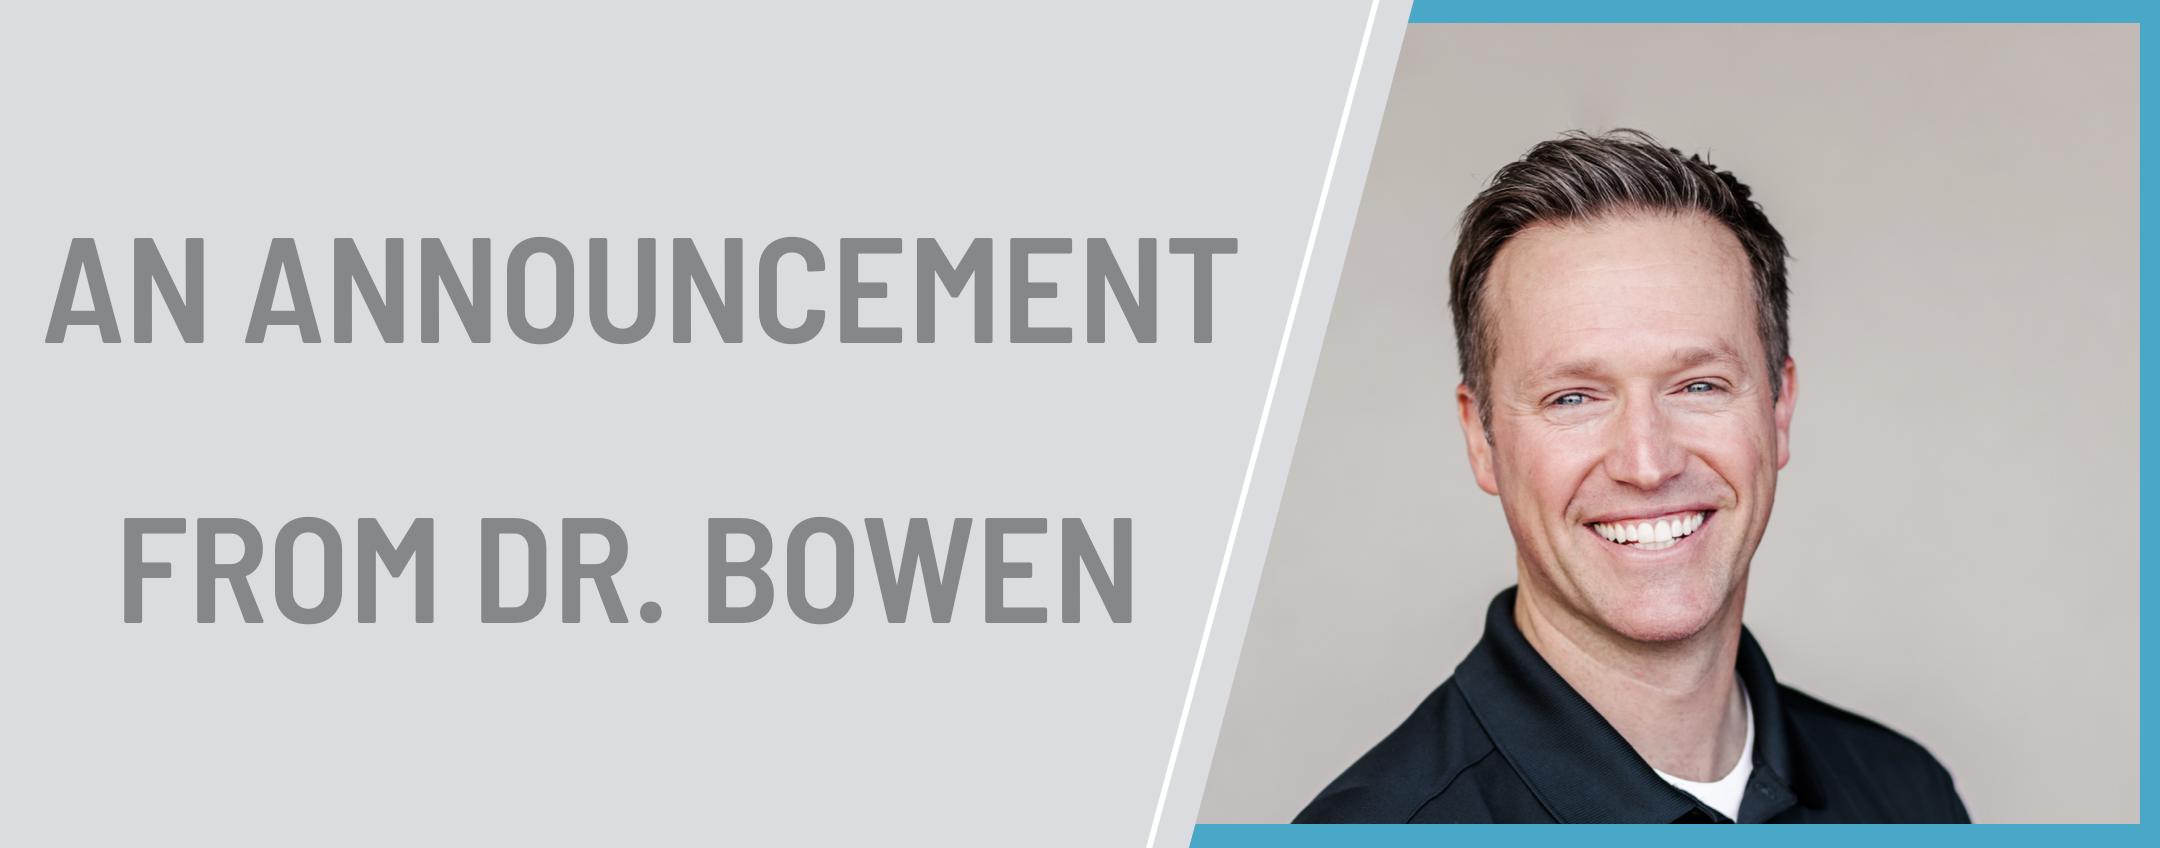 1-announcement-from-dr.-bowen